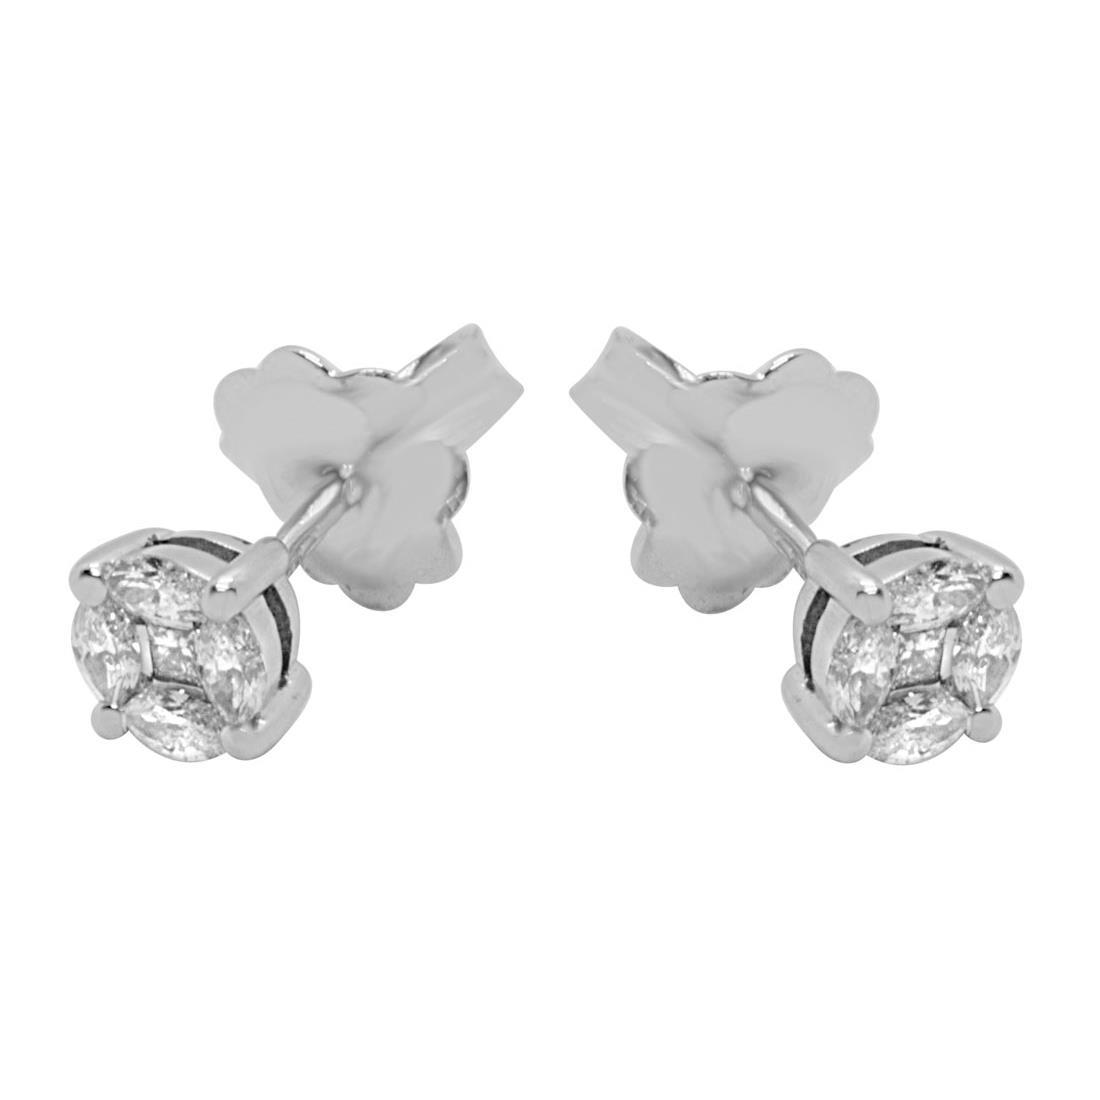 Orecchini Alfieri & St Joh con diamanti ct 0,32 - ALFIERI ST JOHN